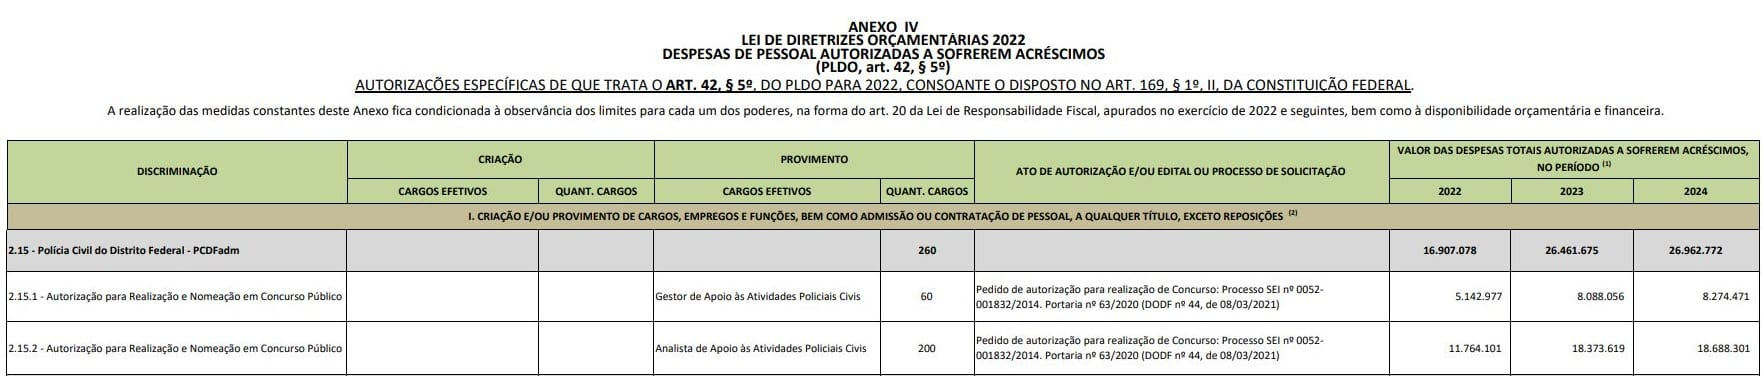 Concurso PCDF administrativa previsto na PLDO 2022